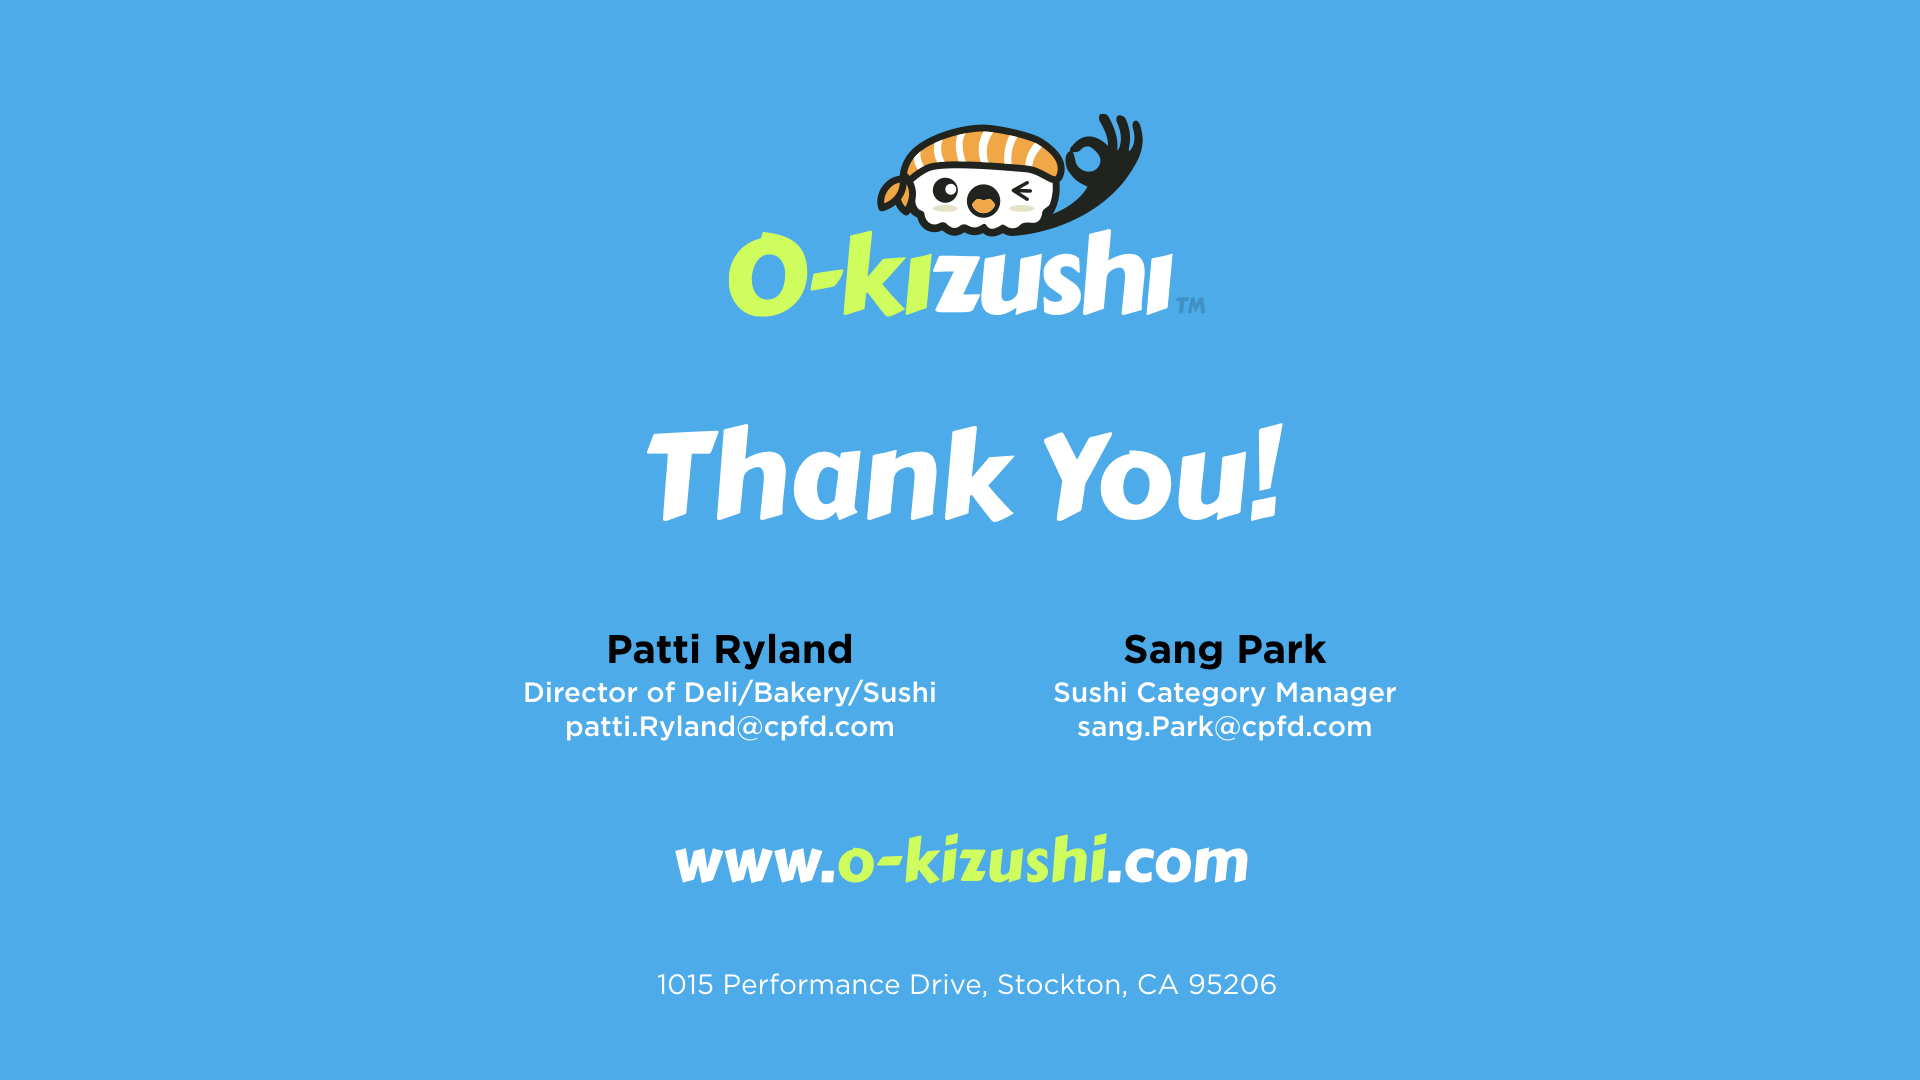 o-kizushi-proposal-generic01.024.jpeg